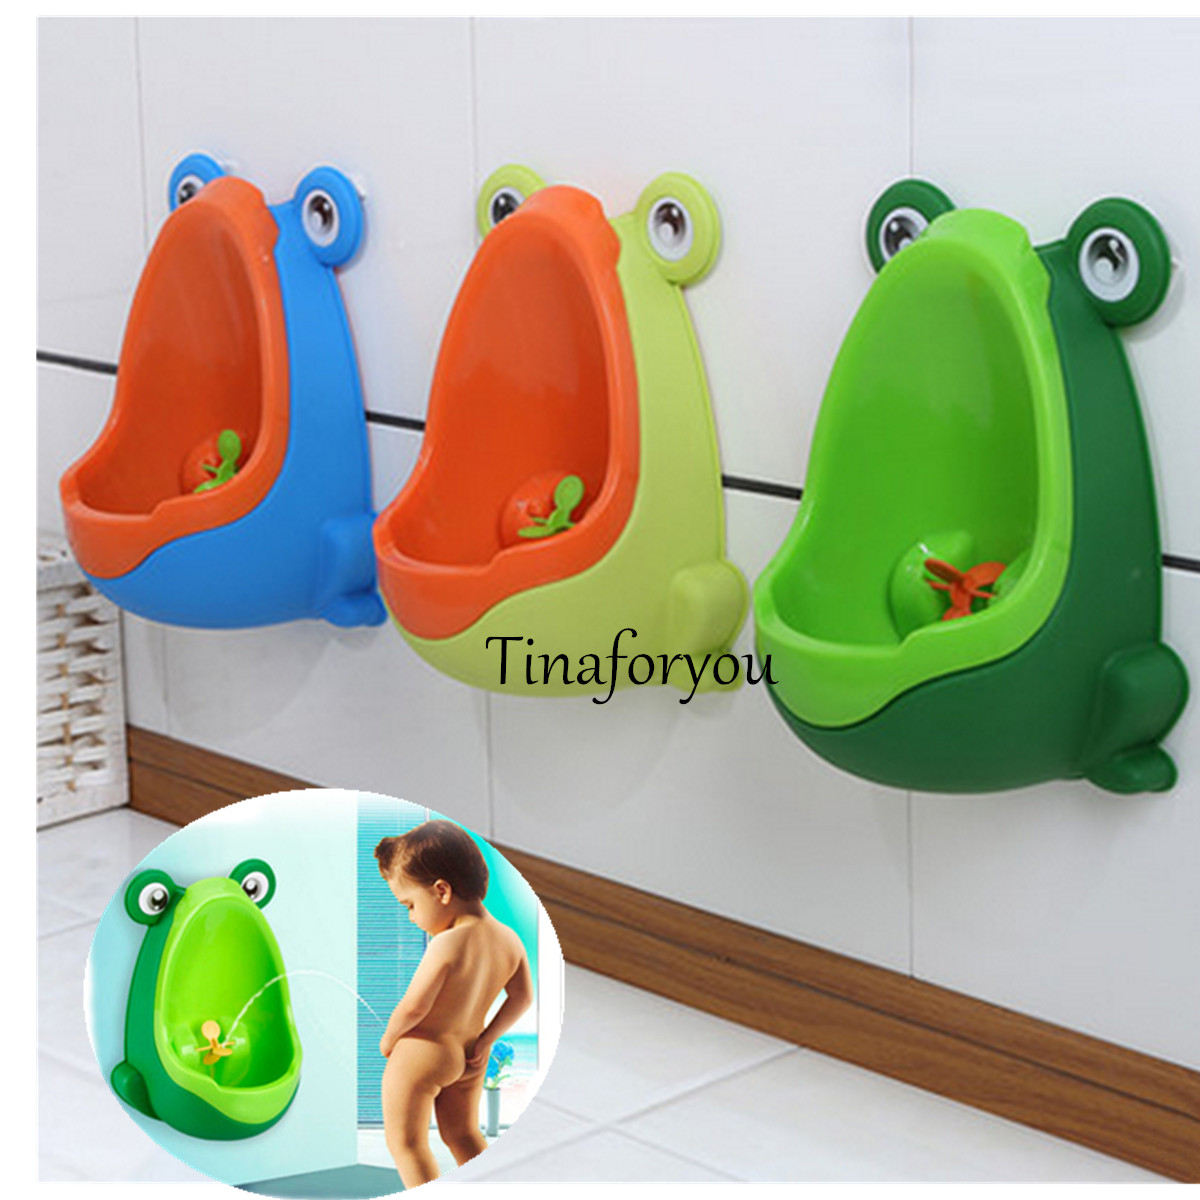 urinoir en plastique enfants toddler potty pee toilettes de formation entra neur ebay. Black Bedroom Furniture Sets. Home Design Ideas